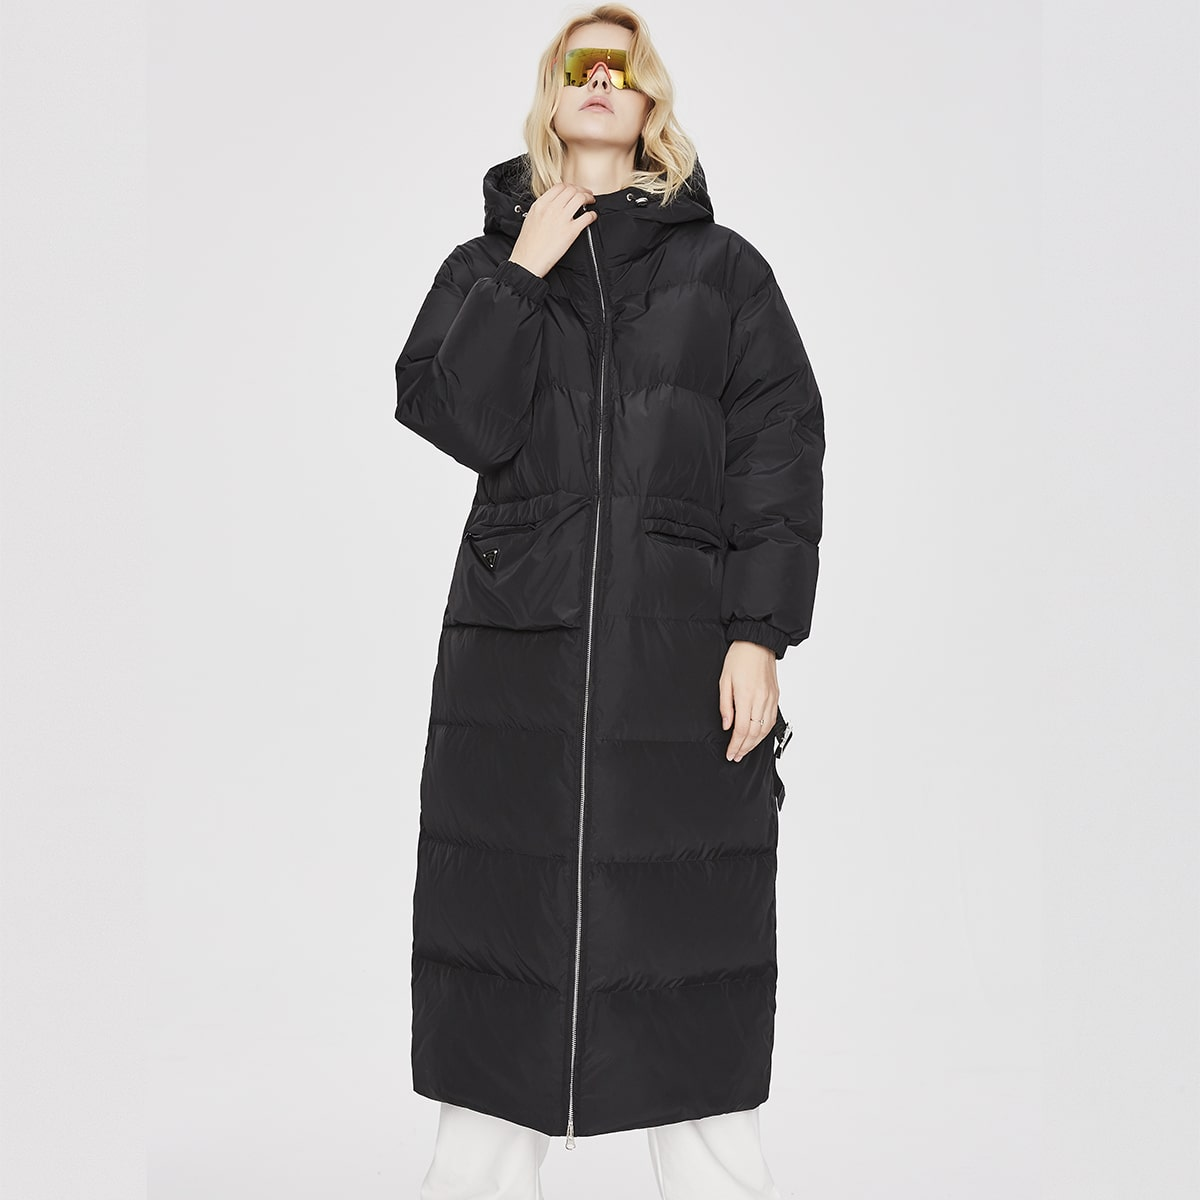 Zip Up Buckle Belted Hooded Down Coat